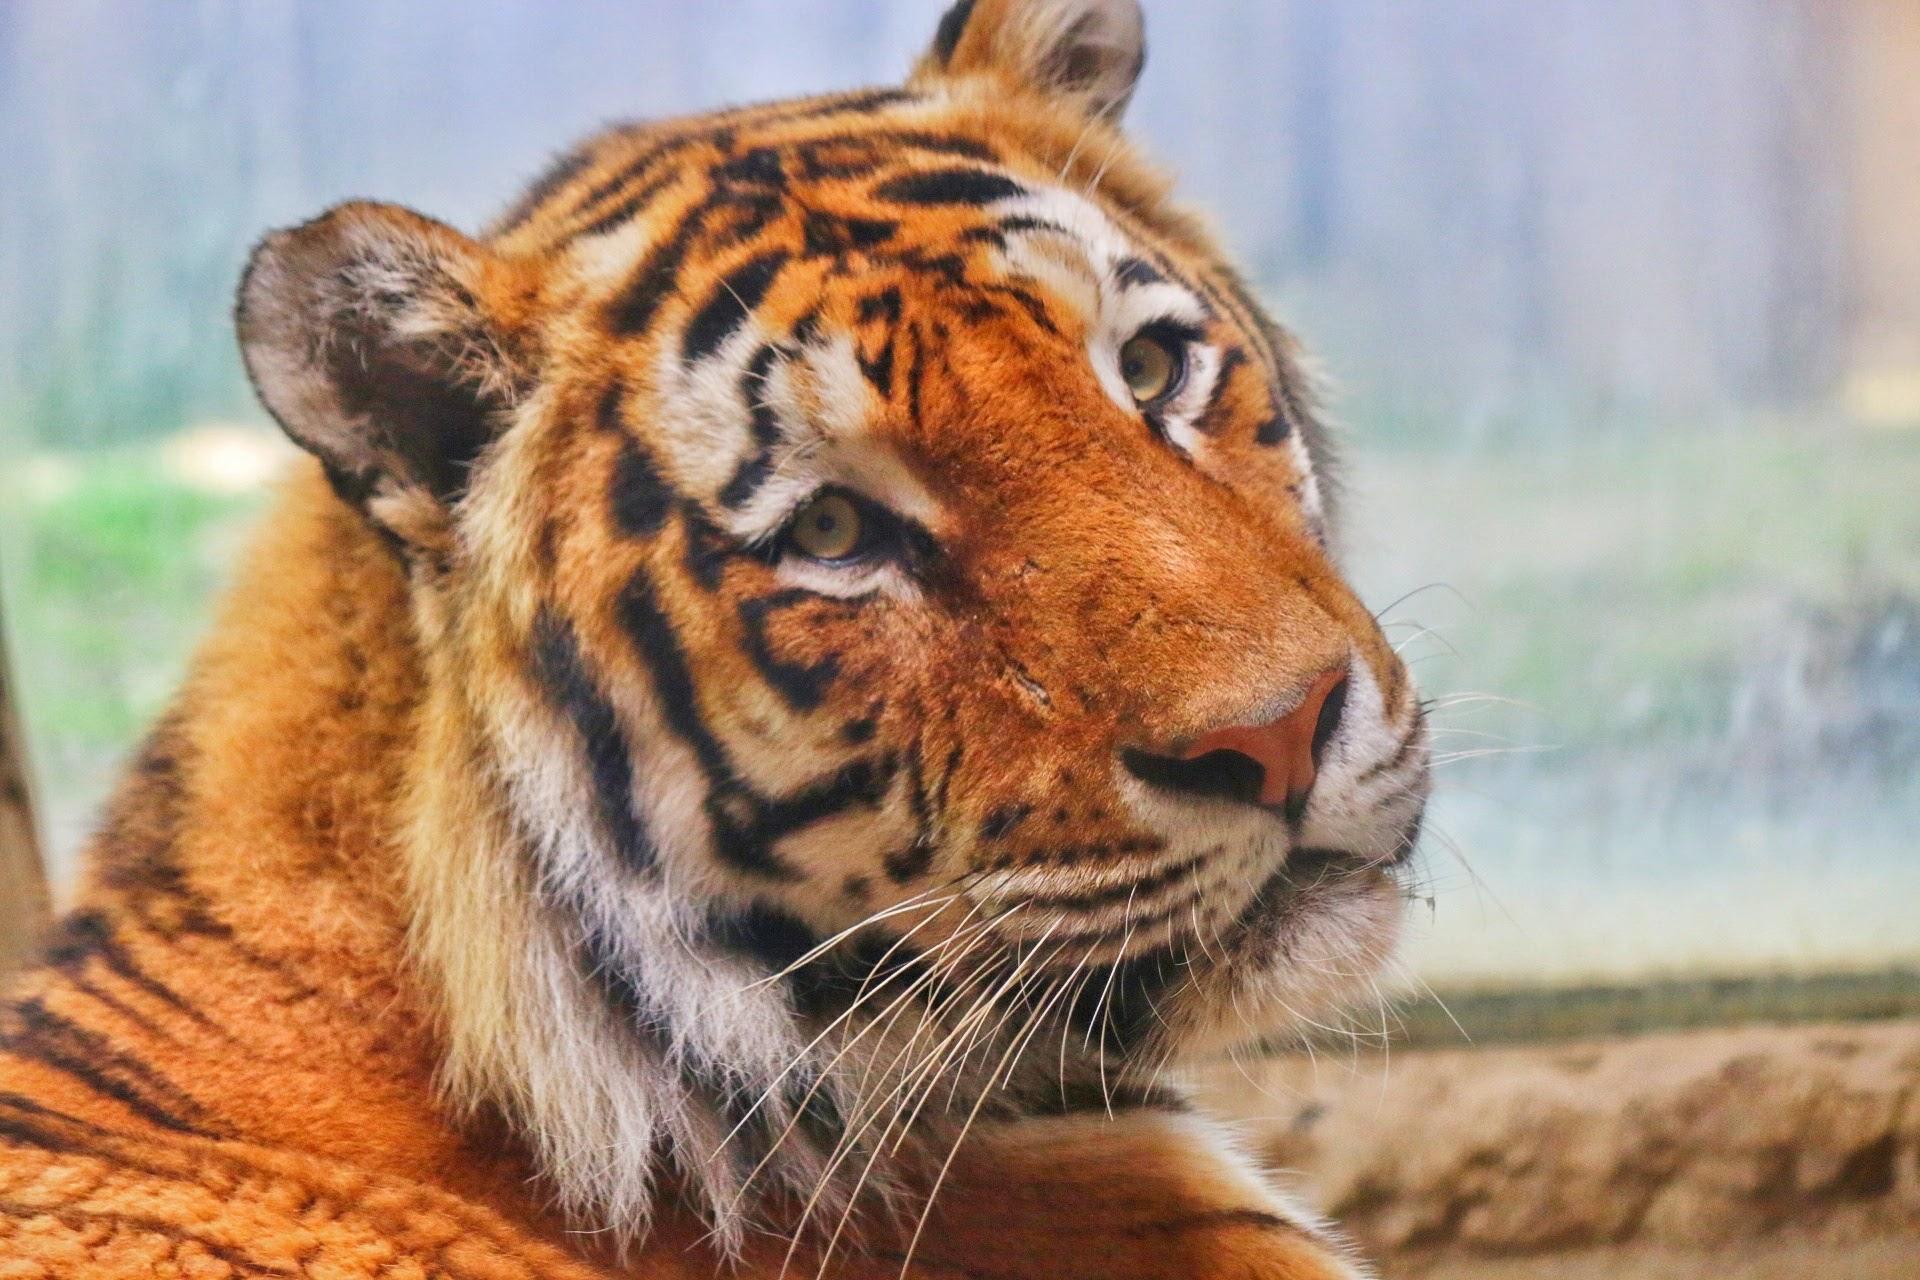 Zoom Erlebniswelt Zoo Gelsenkirchen Tiger